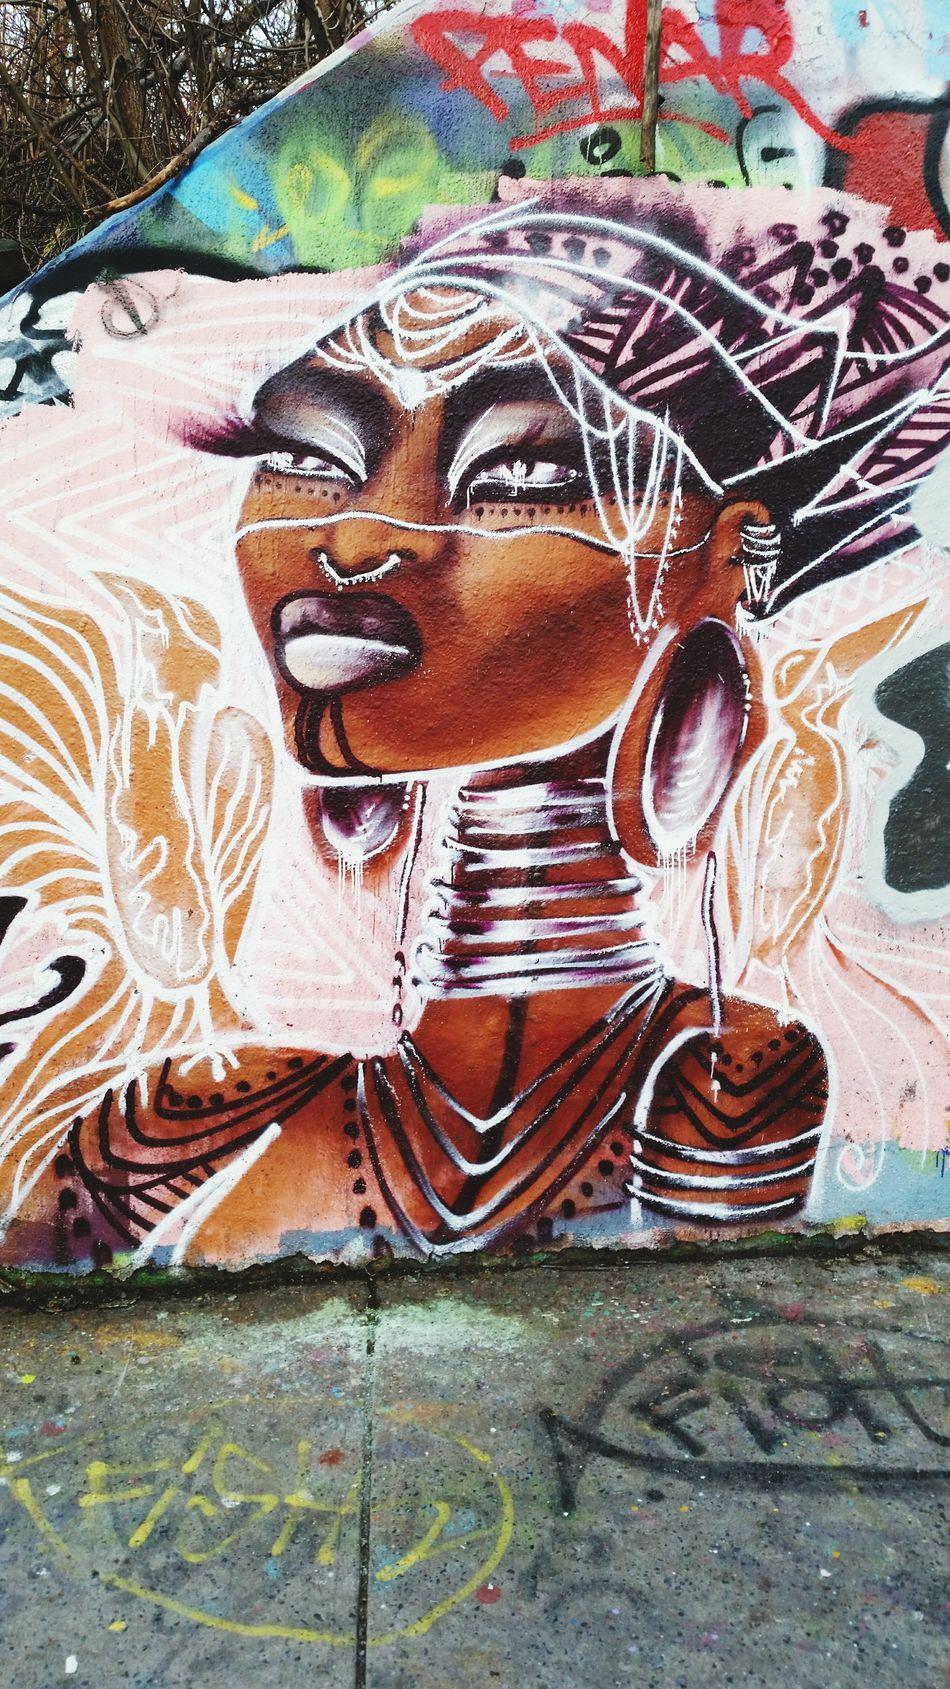 Strong Woman... Wonder woman... Always and forever strong... Graffiti Art Grafika Grafitti Graffiti Wall Melitowalks Melito-arts Africanwoman Worldwoman